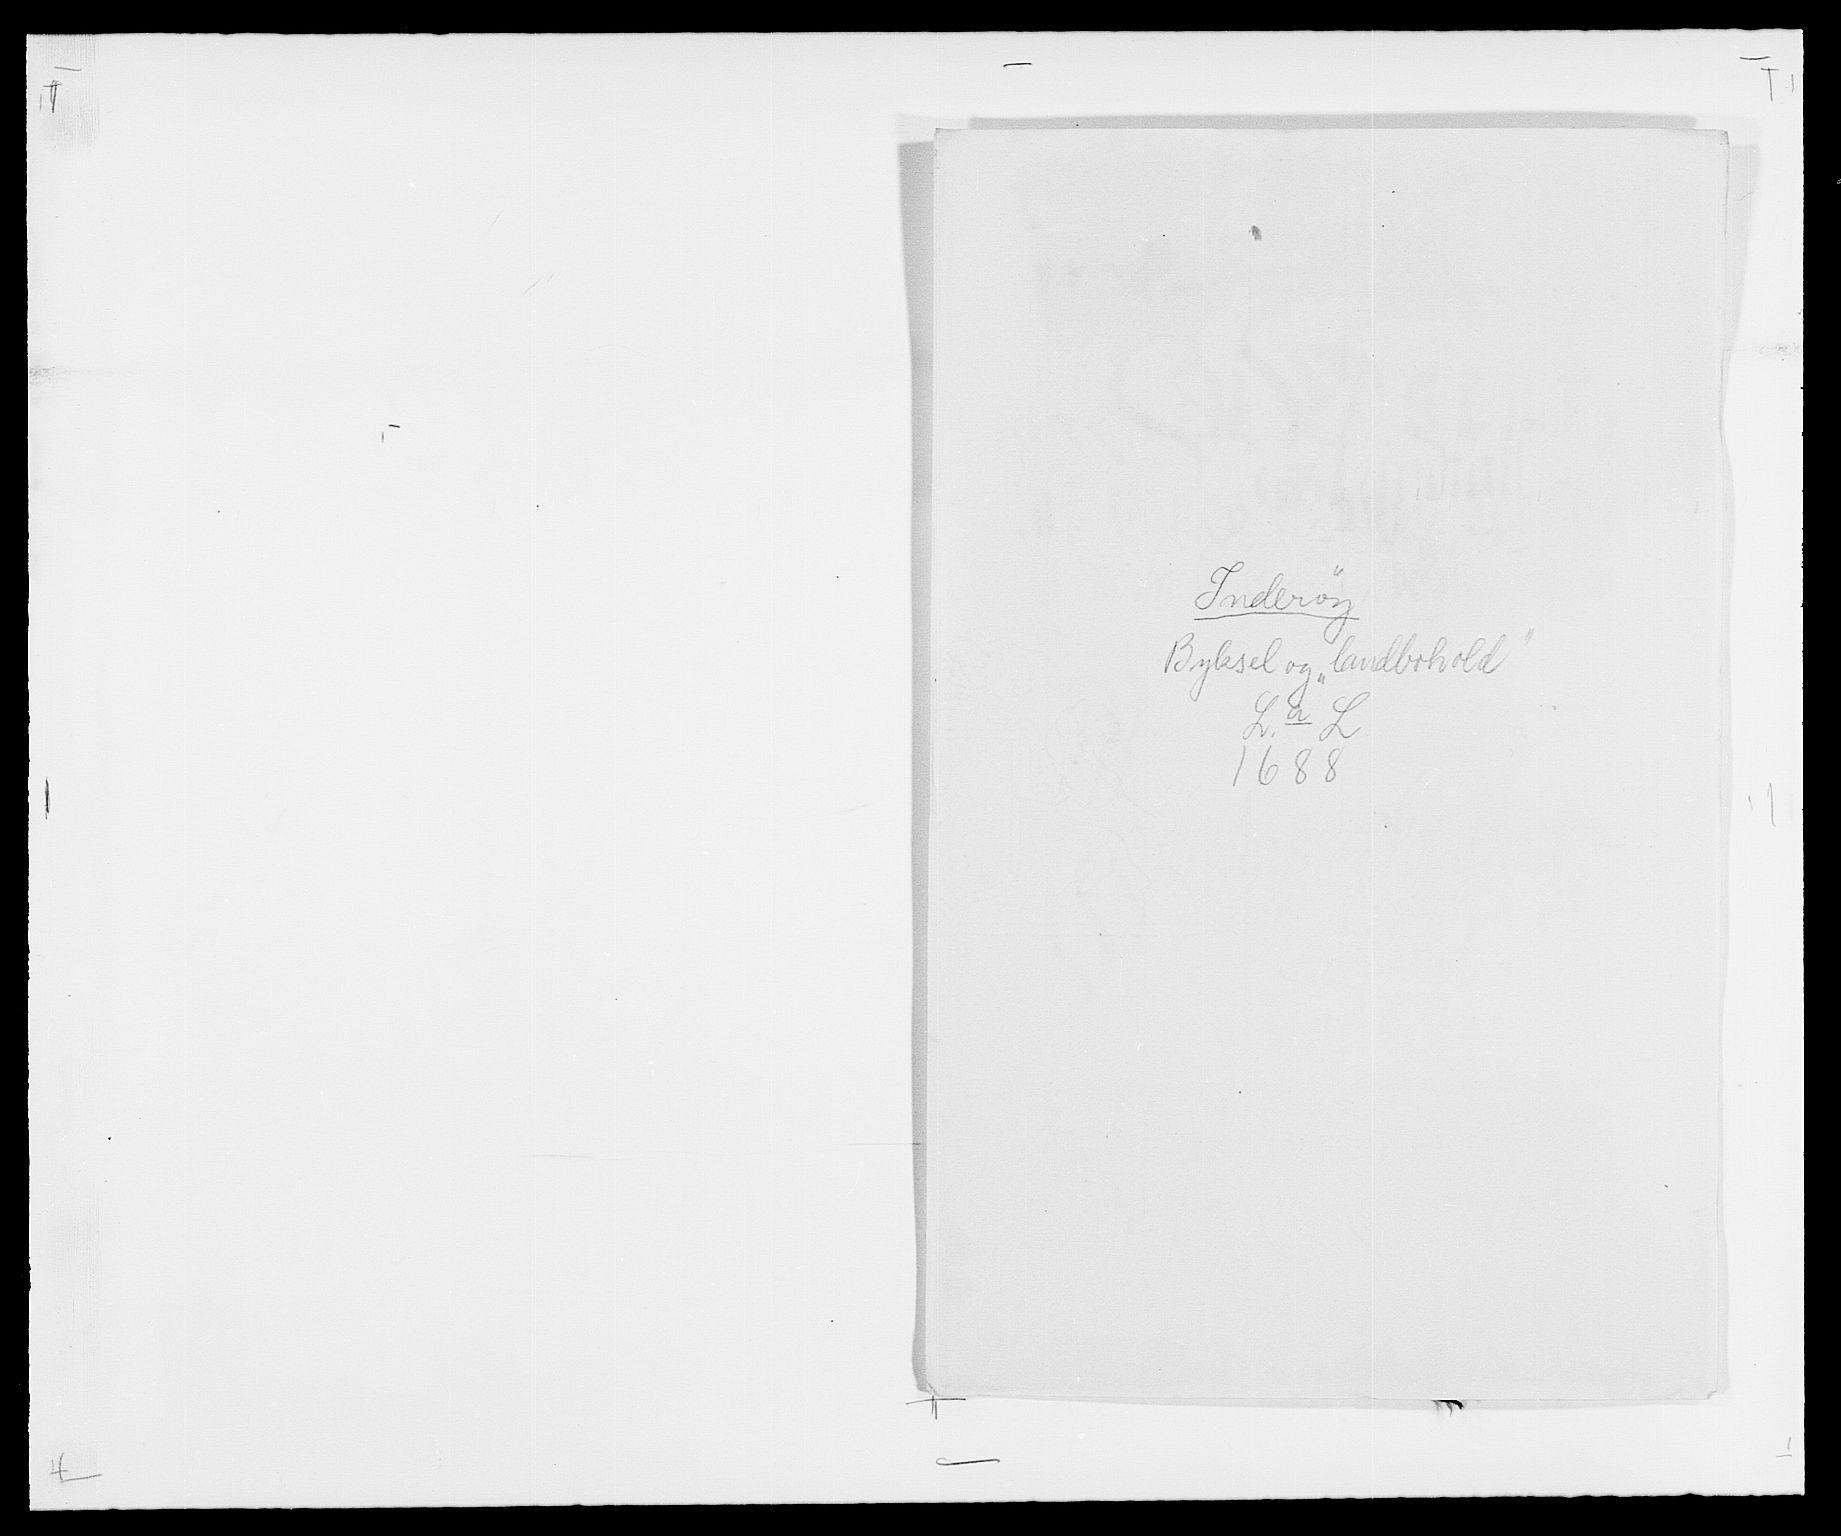 RA, Rentekammeret inntil 1814, Reviderte regnskaper, Fogderegnskap, R63/L4306: Fogderegnskap Inderøy, 1687-1689, s. 329